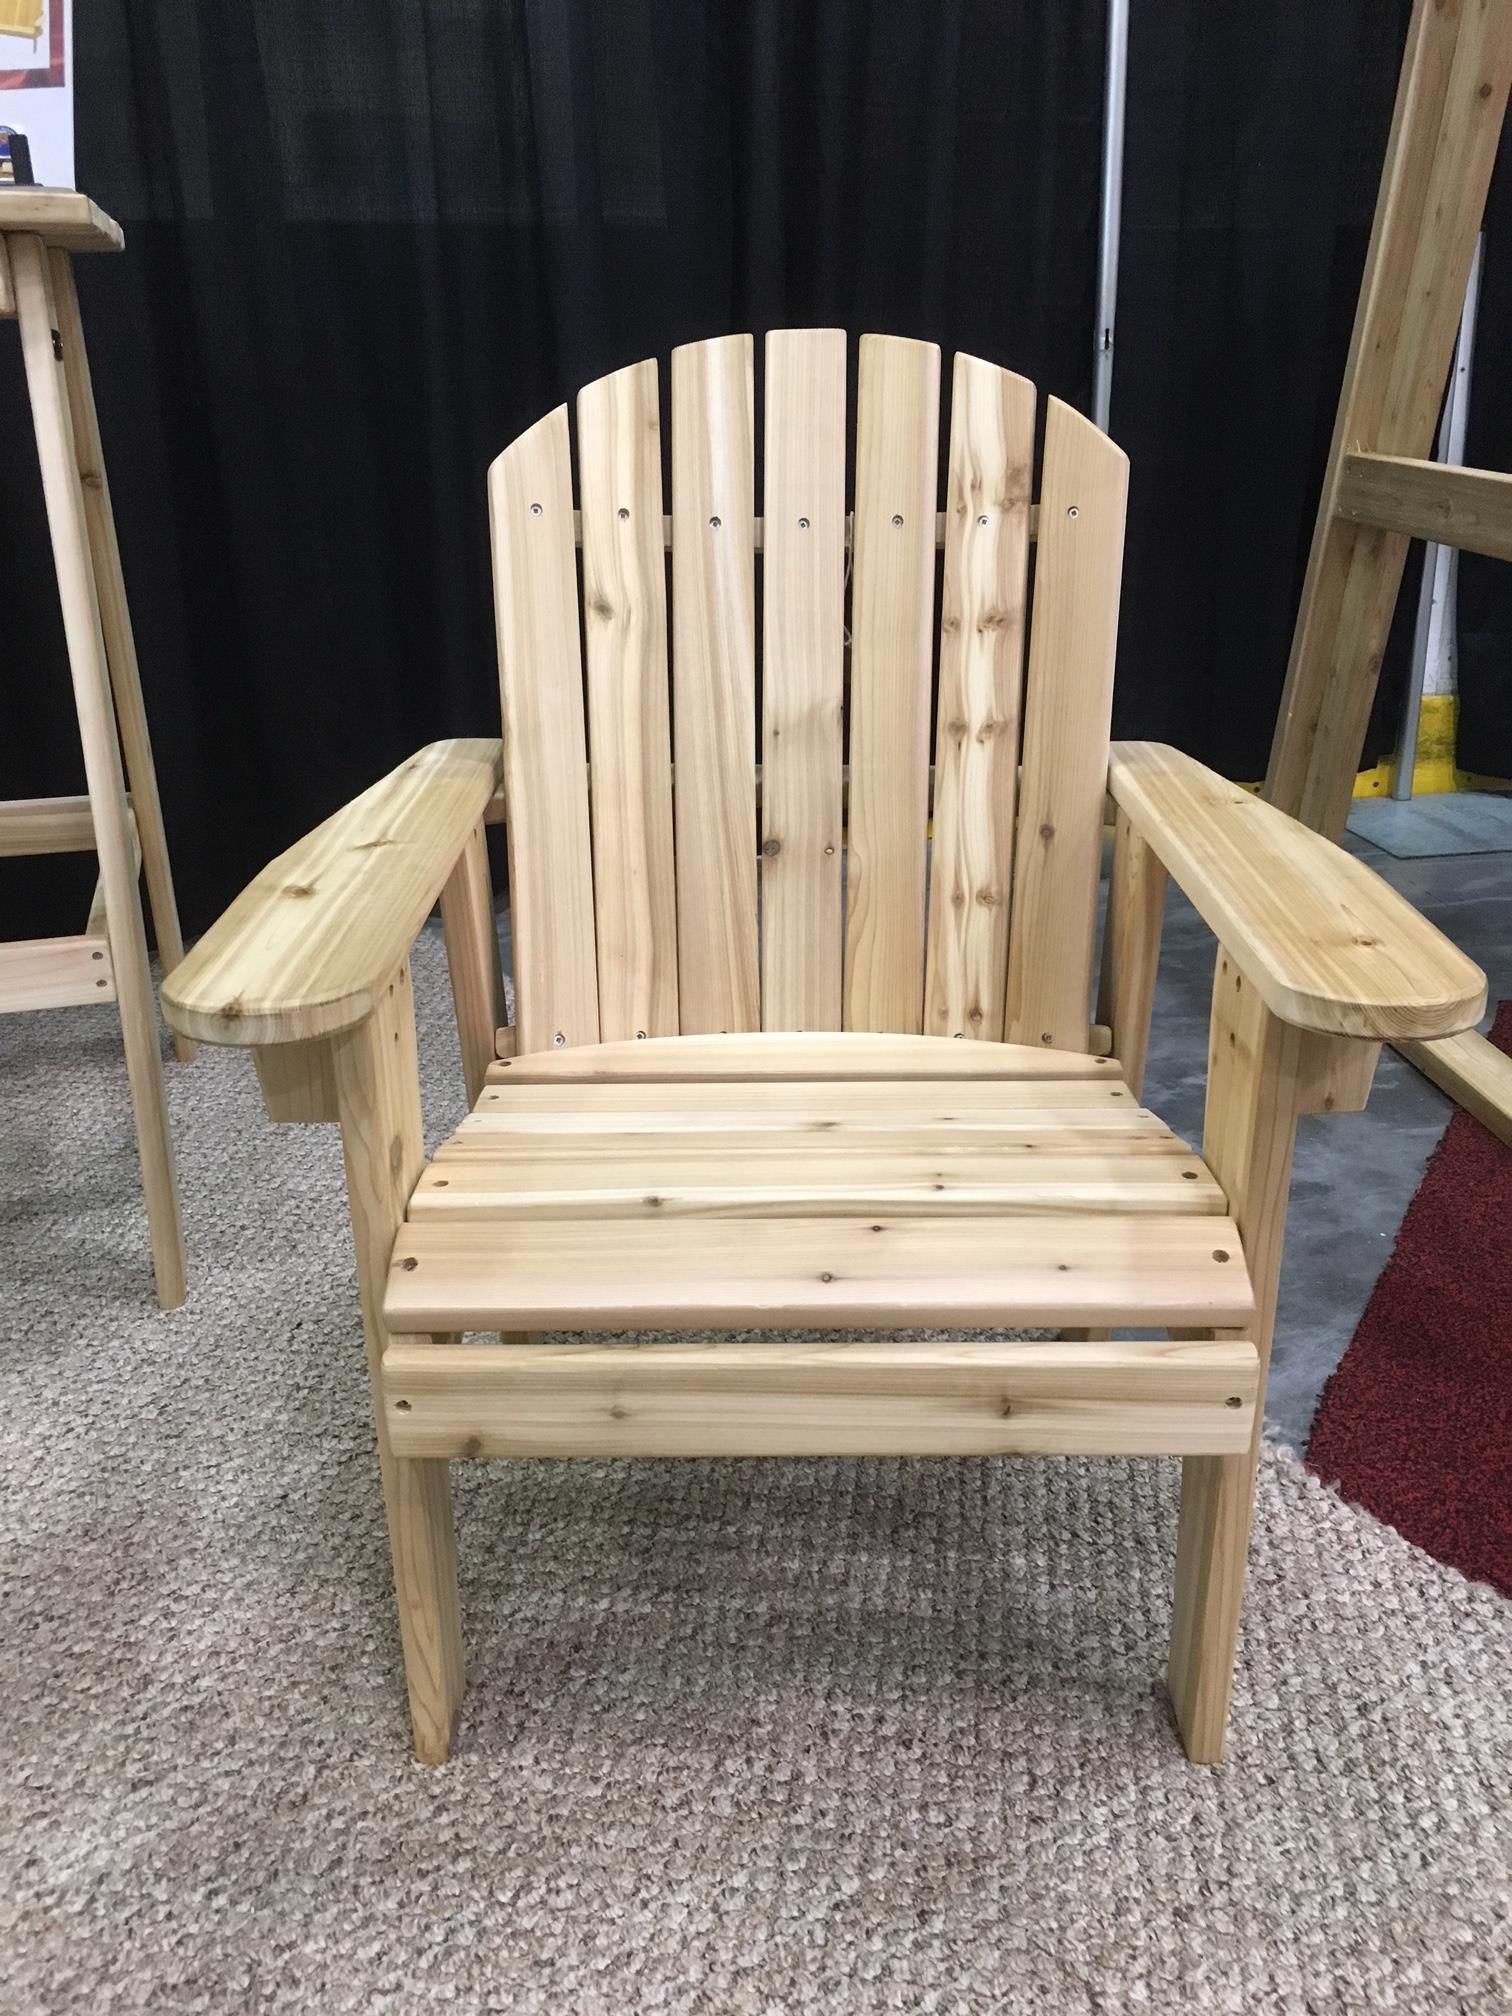 https://0901.nccdn.net/4_2/000/000/019/c2c/gardenchair-tradeshow.JPG